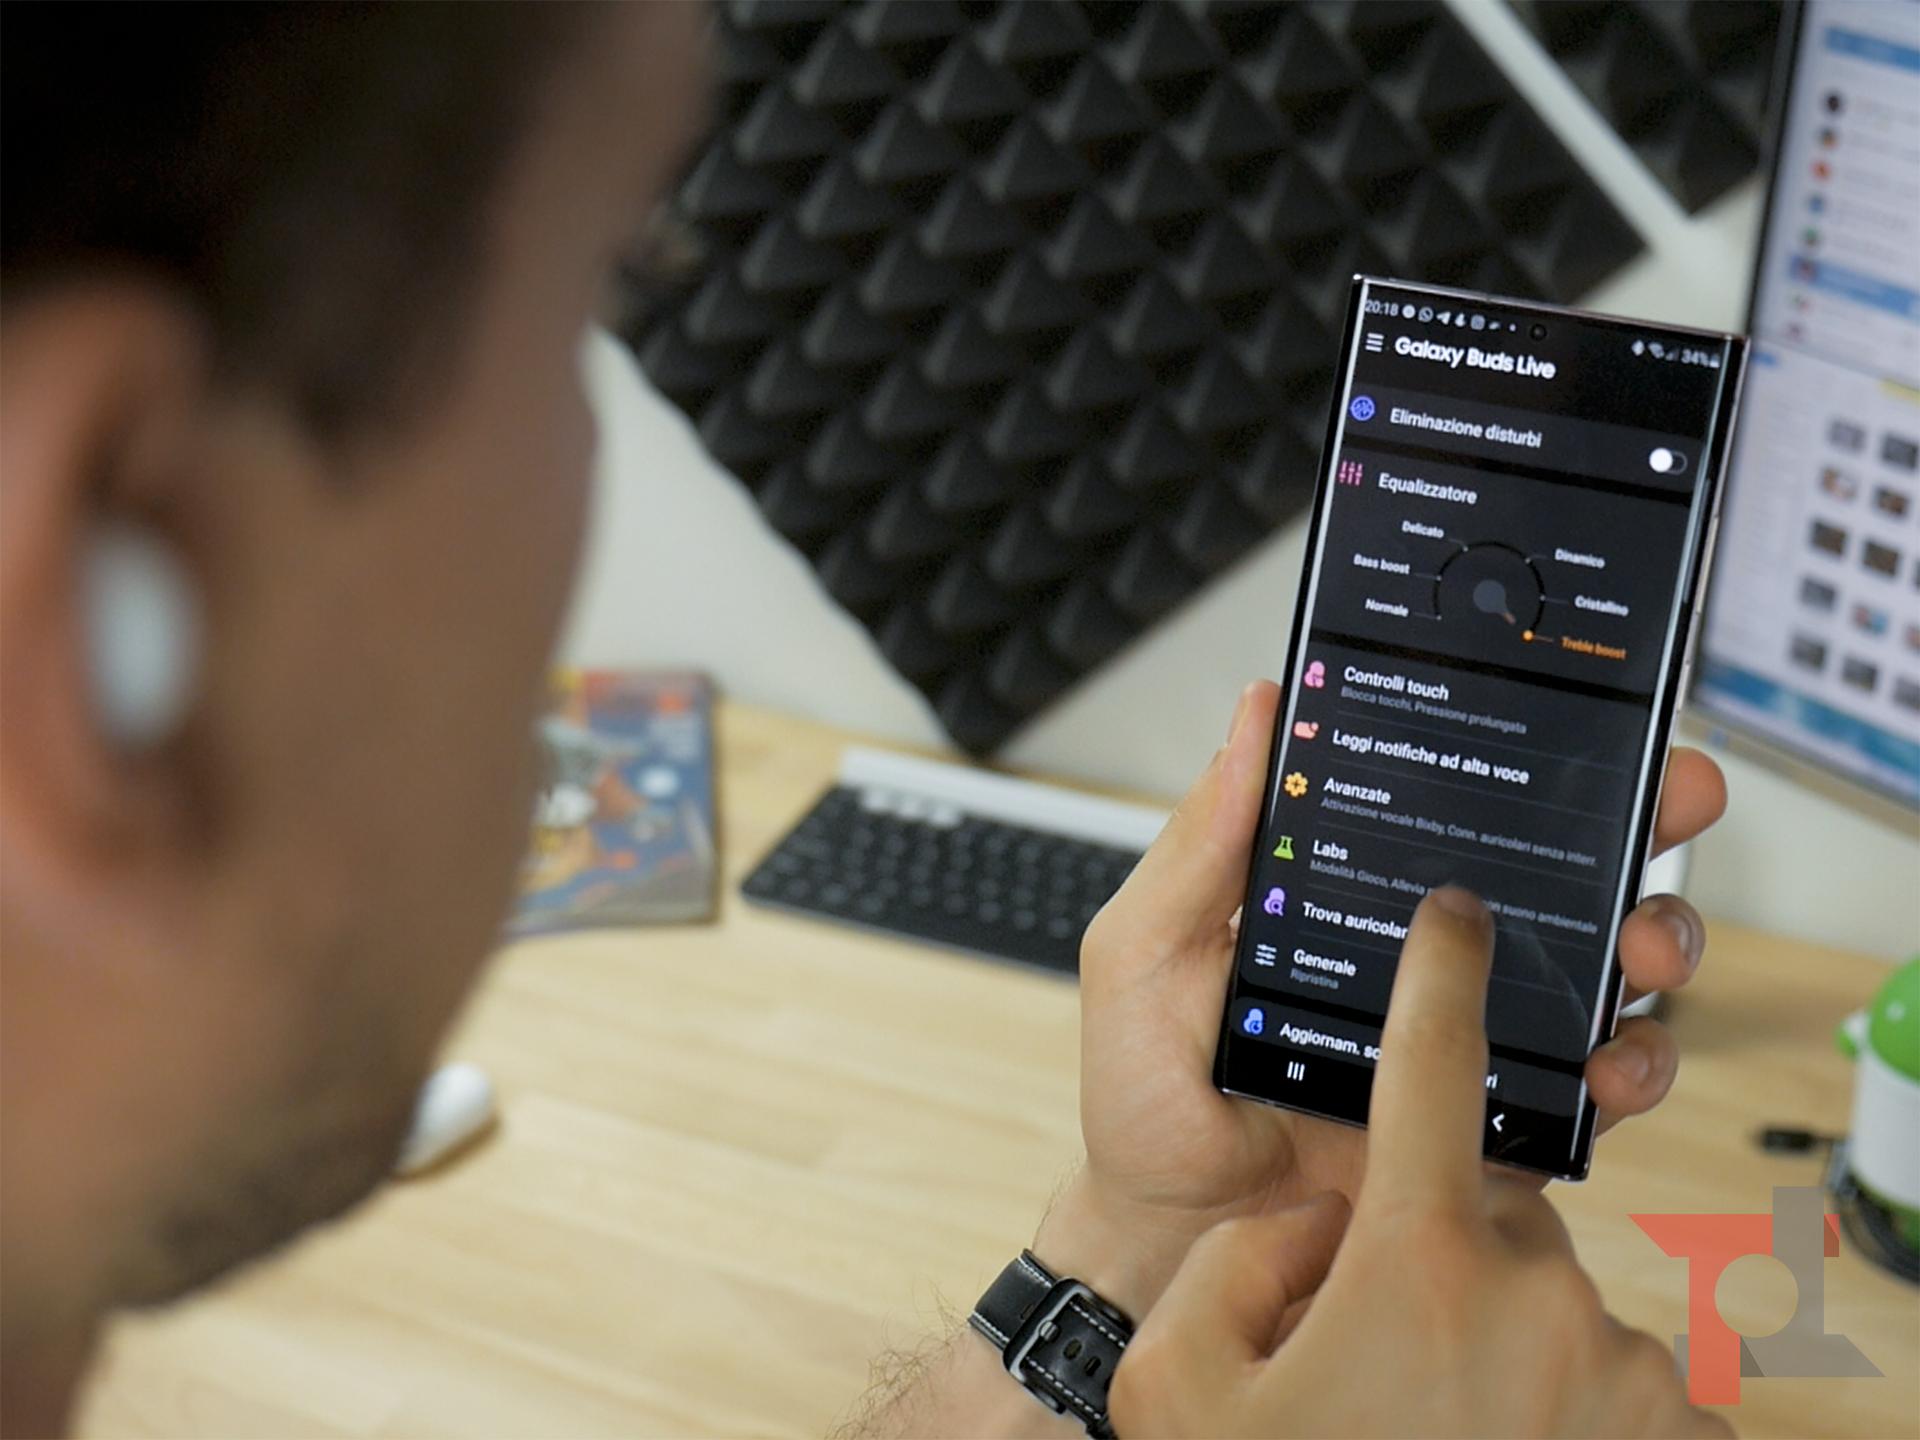 Recensione Samsung Galaxy Buds Live: design open-type promosso 6